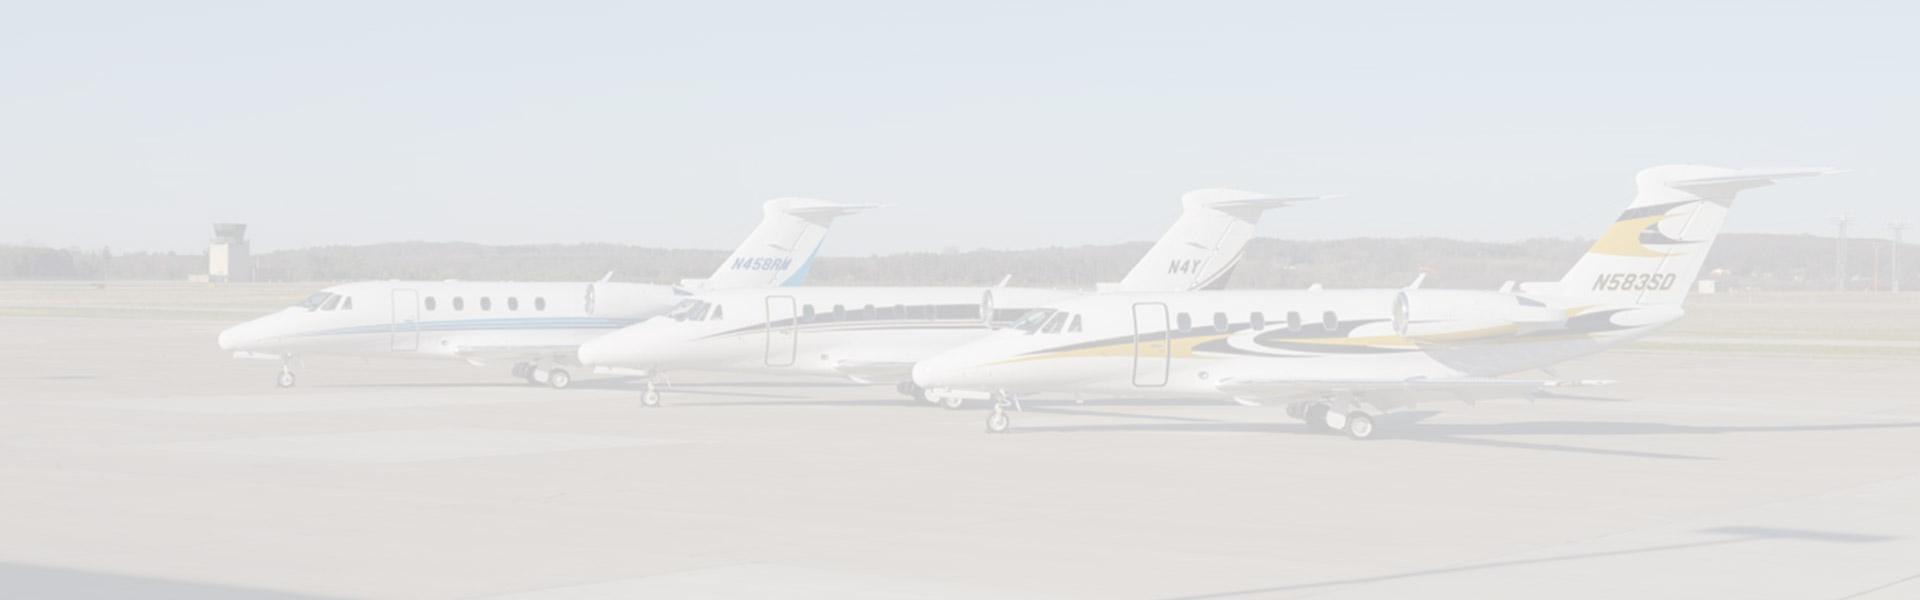 Flight Instruction, Heartland Aviation, Air Charters